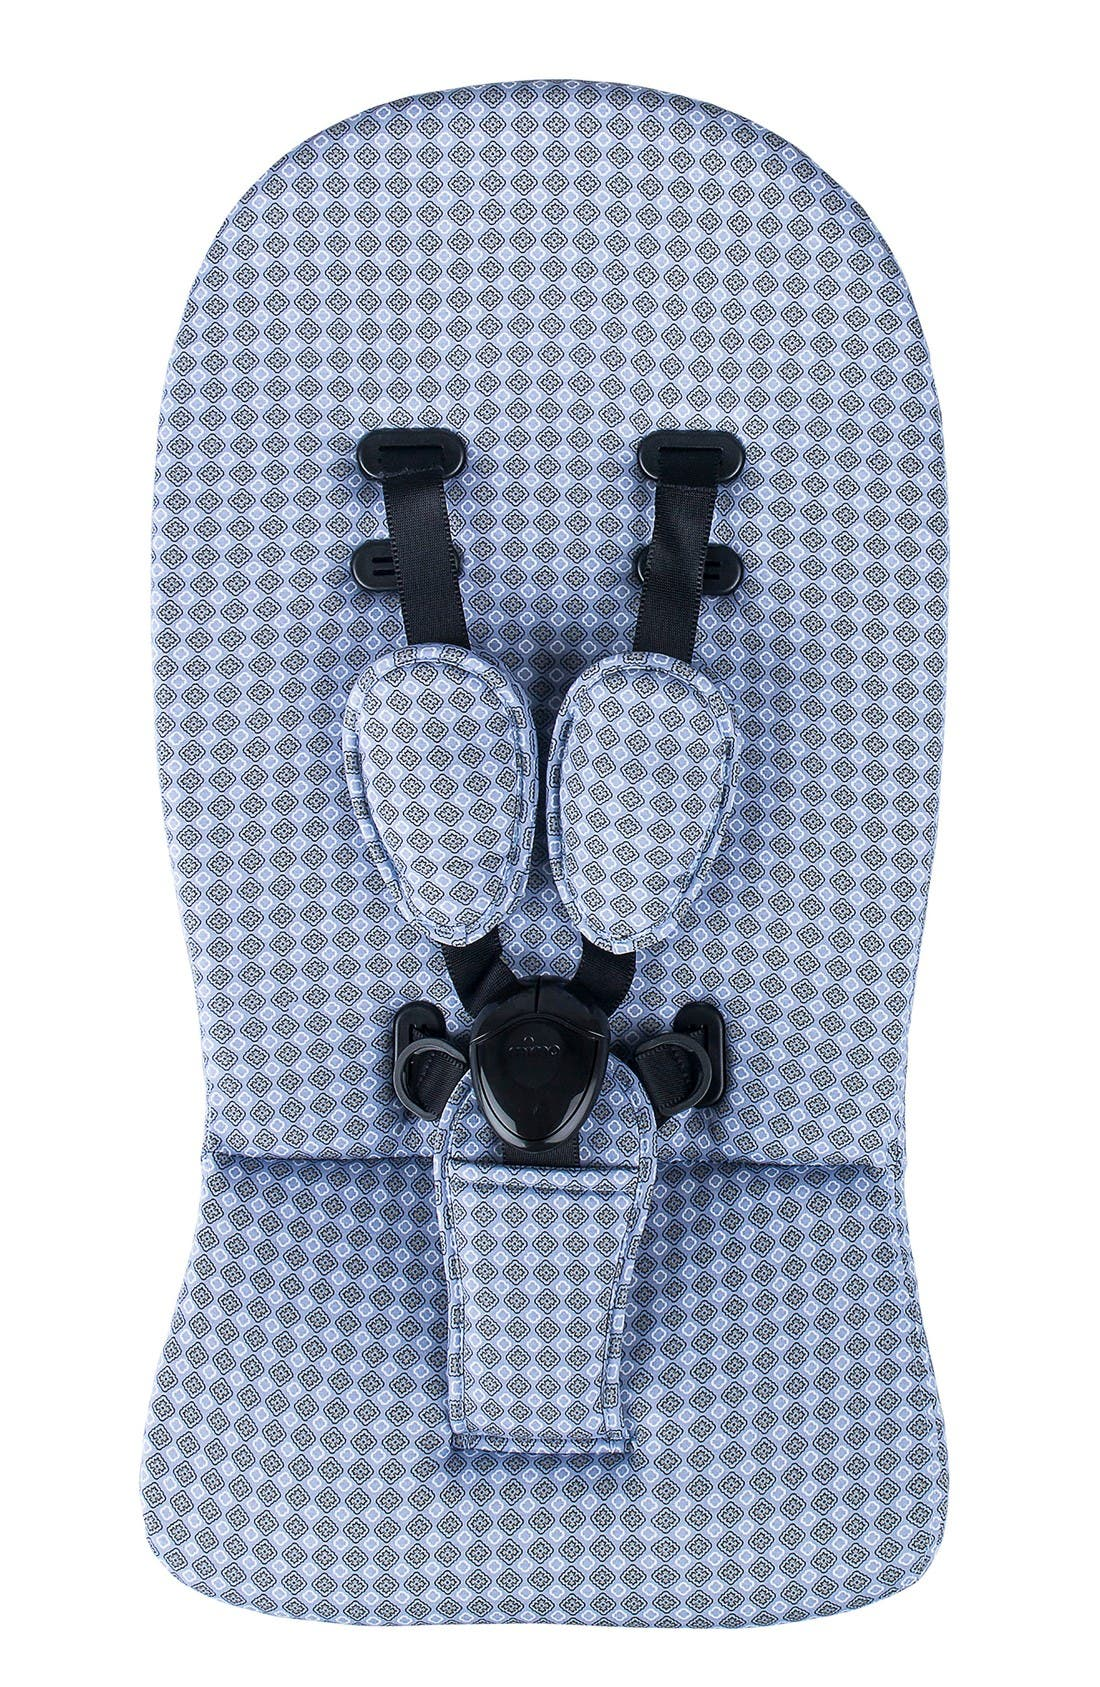 Comfort Padding Kit for Mima Xari or Kobi Strollers,                             Main thumbnail 1, color,                             Retro Blue